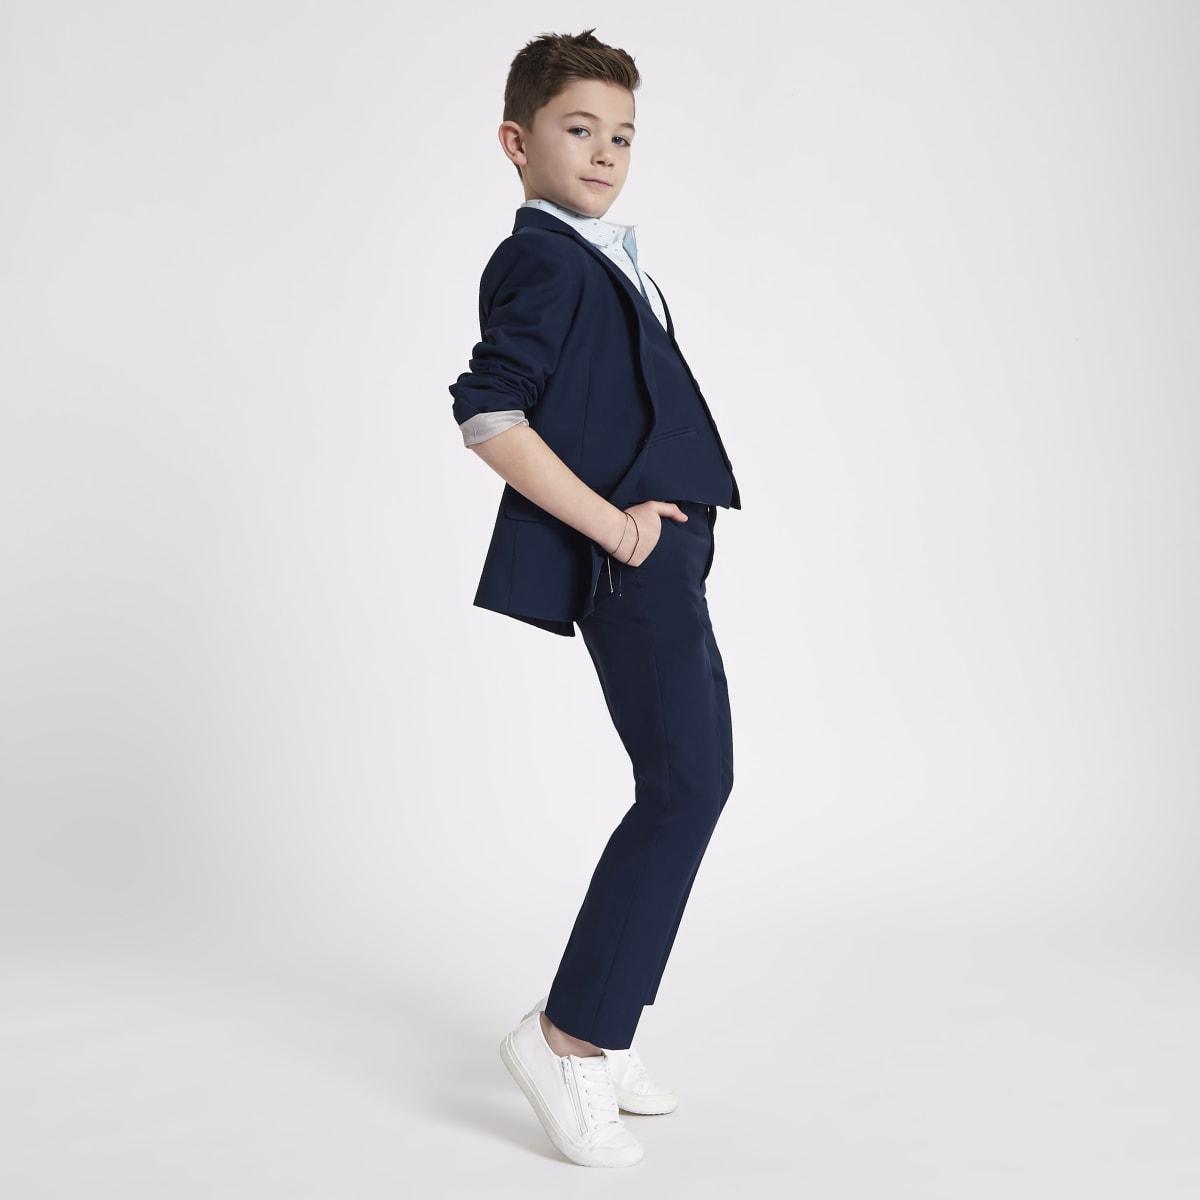 Pantalon de costume bleu marine pour garçon